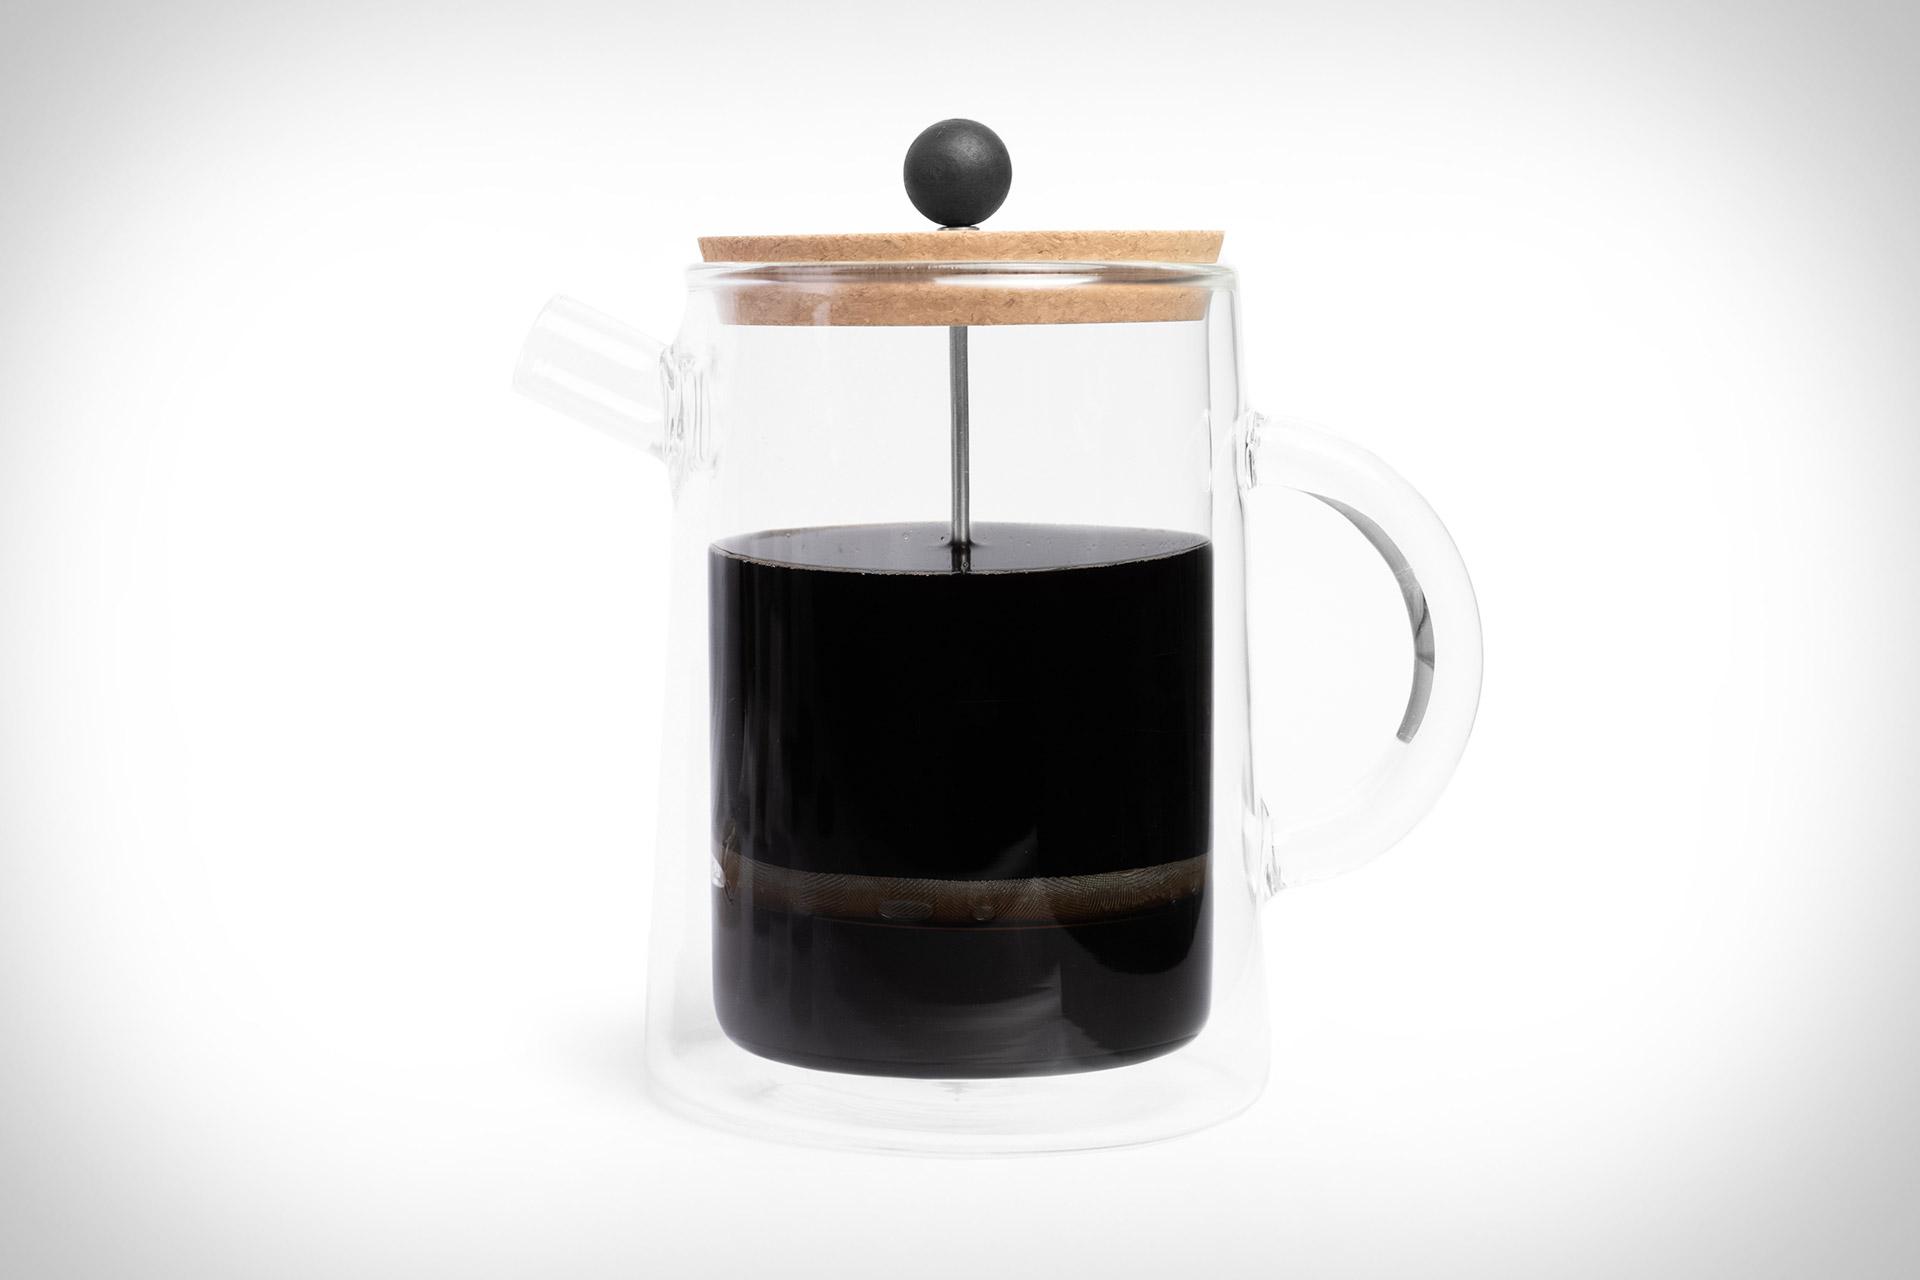 Manual No. 3 Coffee Maker